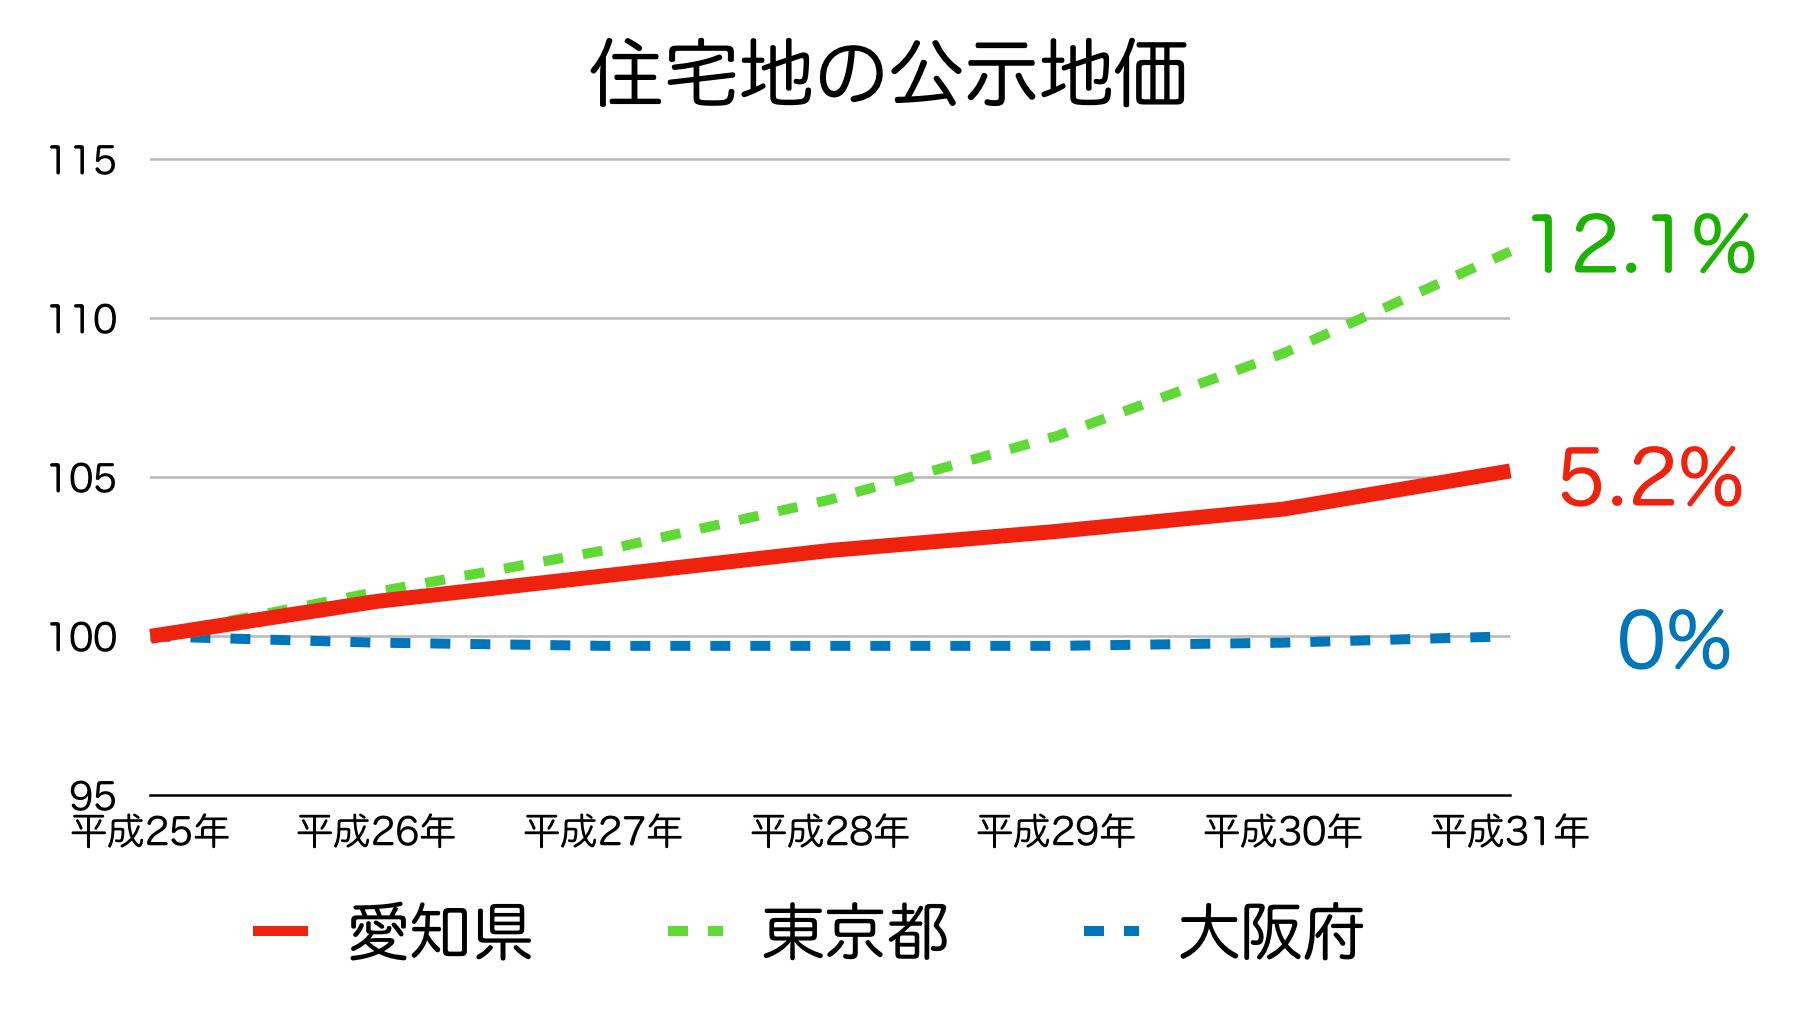 愛知県の公示地価の変化率 H25-H31